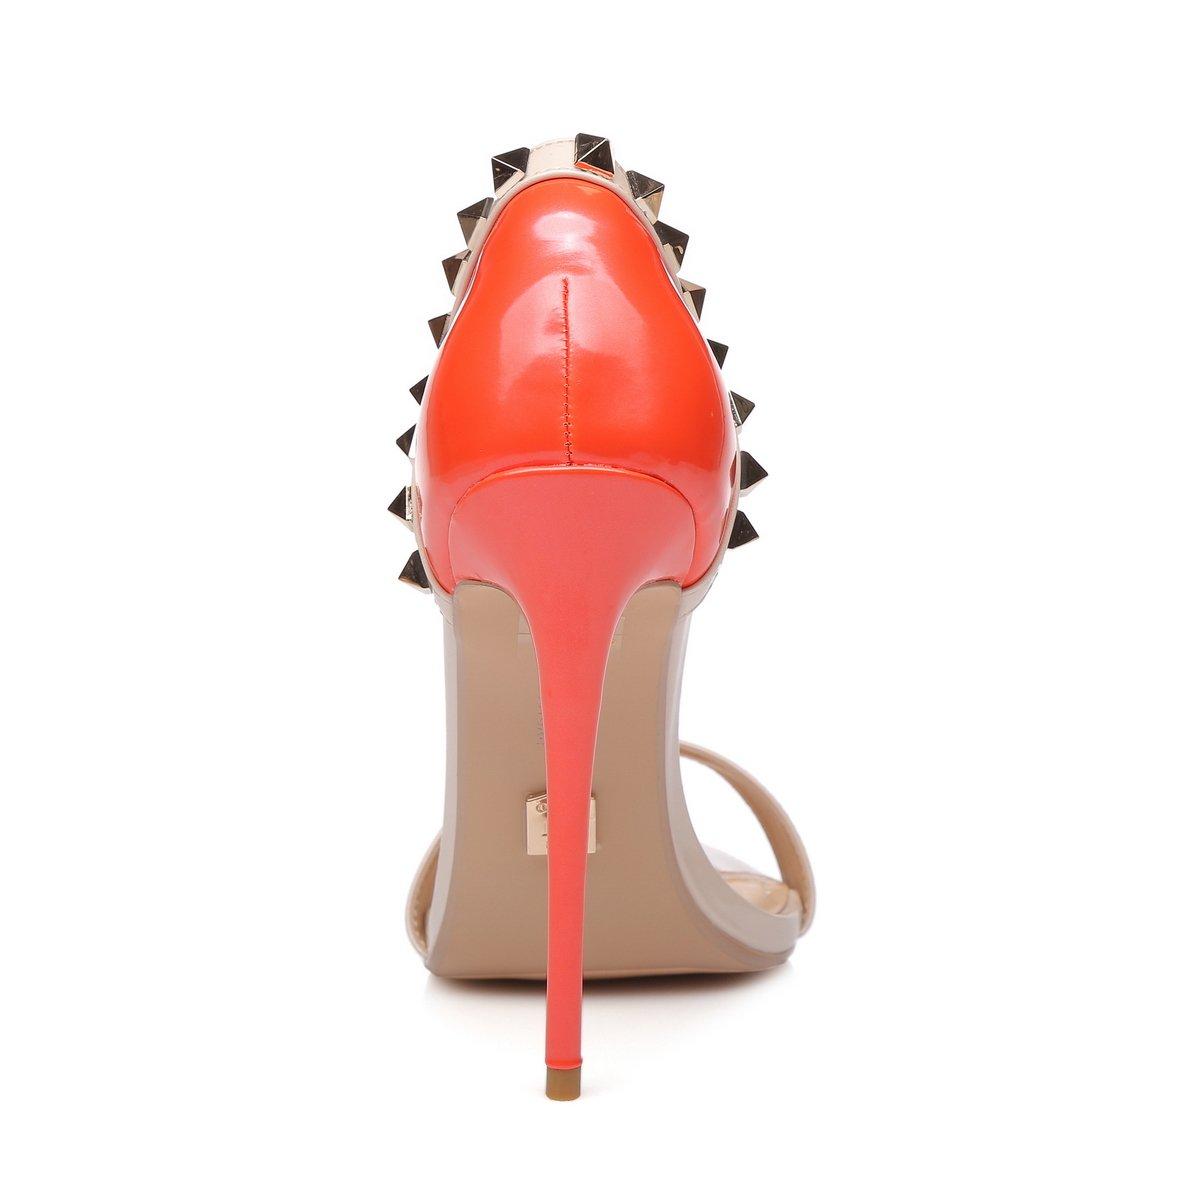 Giaro Sandaletten in in in Übergrößen Beige Indo Coralle Beige große Damenschuhe 3c4a0b